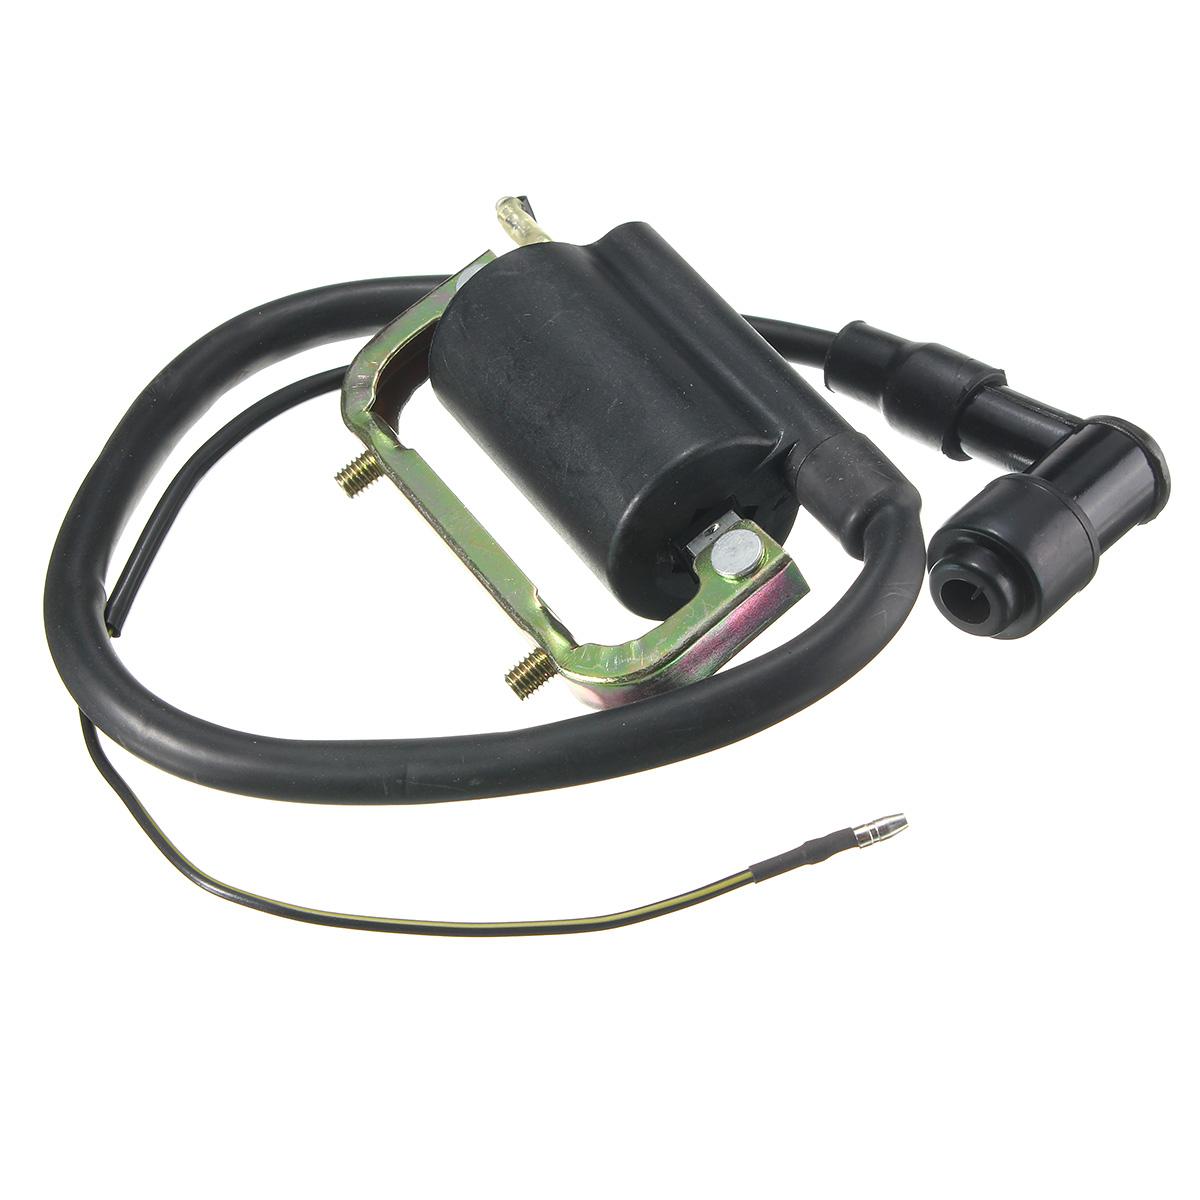 Ignition Coil For Honda CT70 CT70H KO-81' MINI TRAIL 70